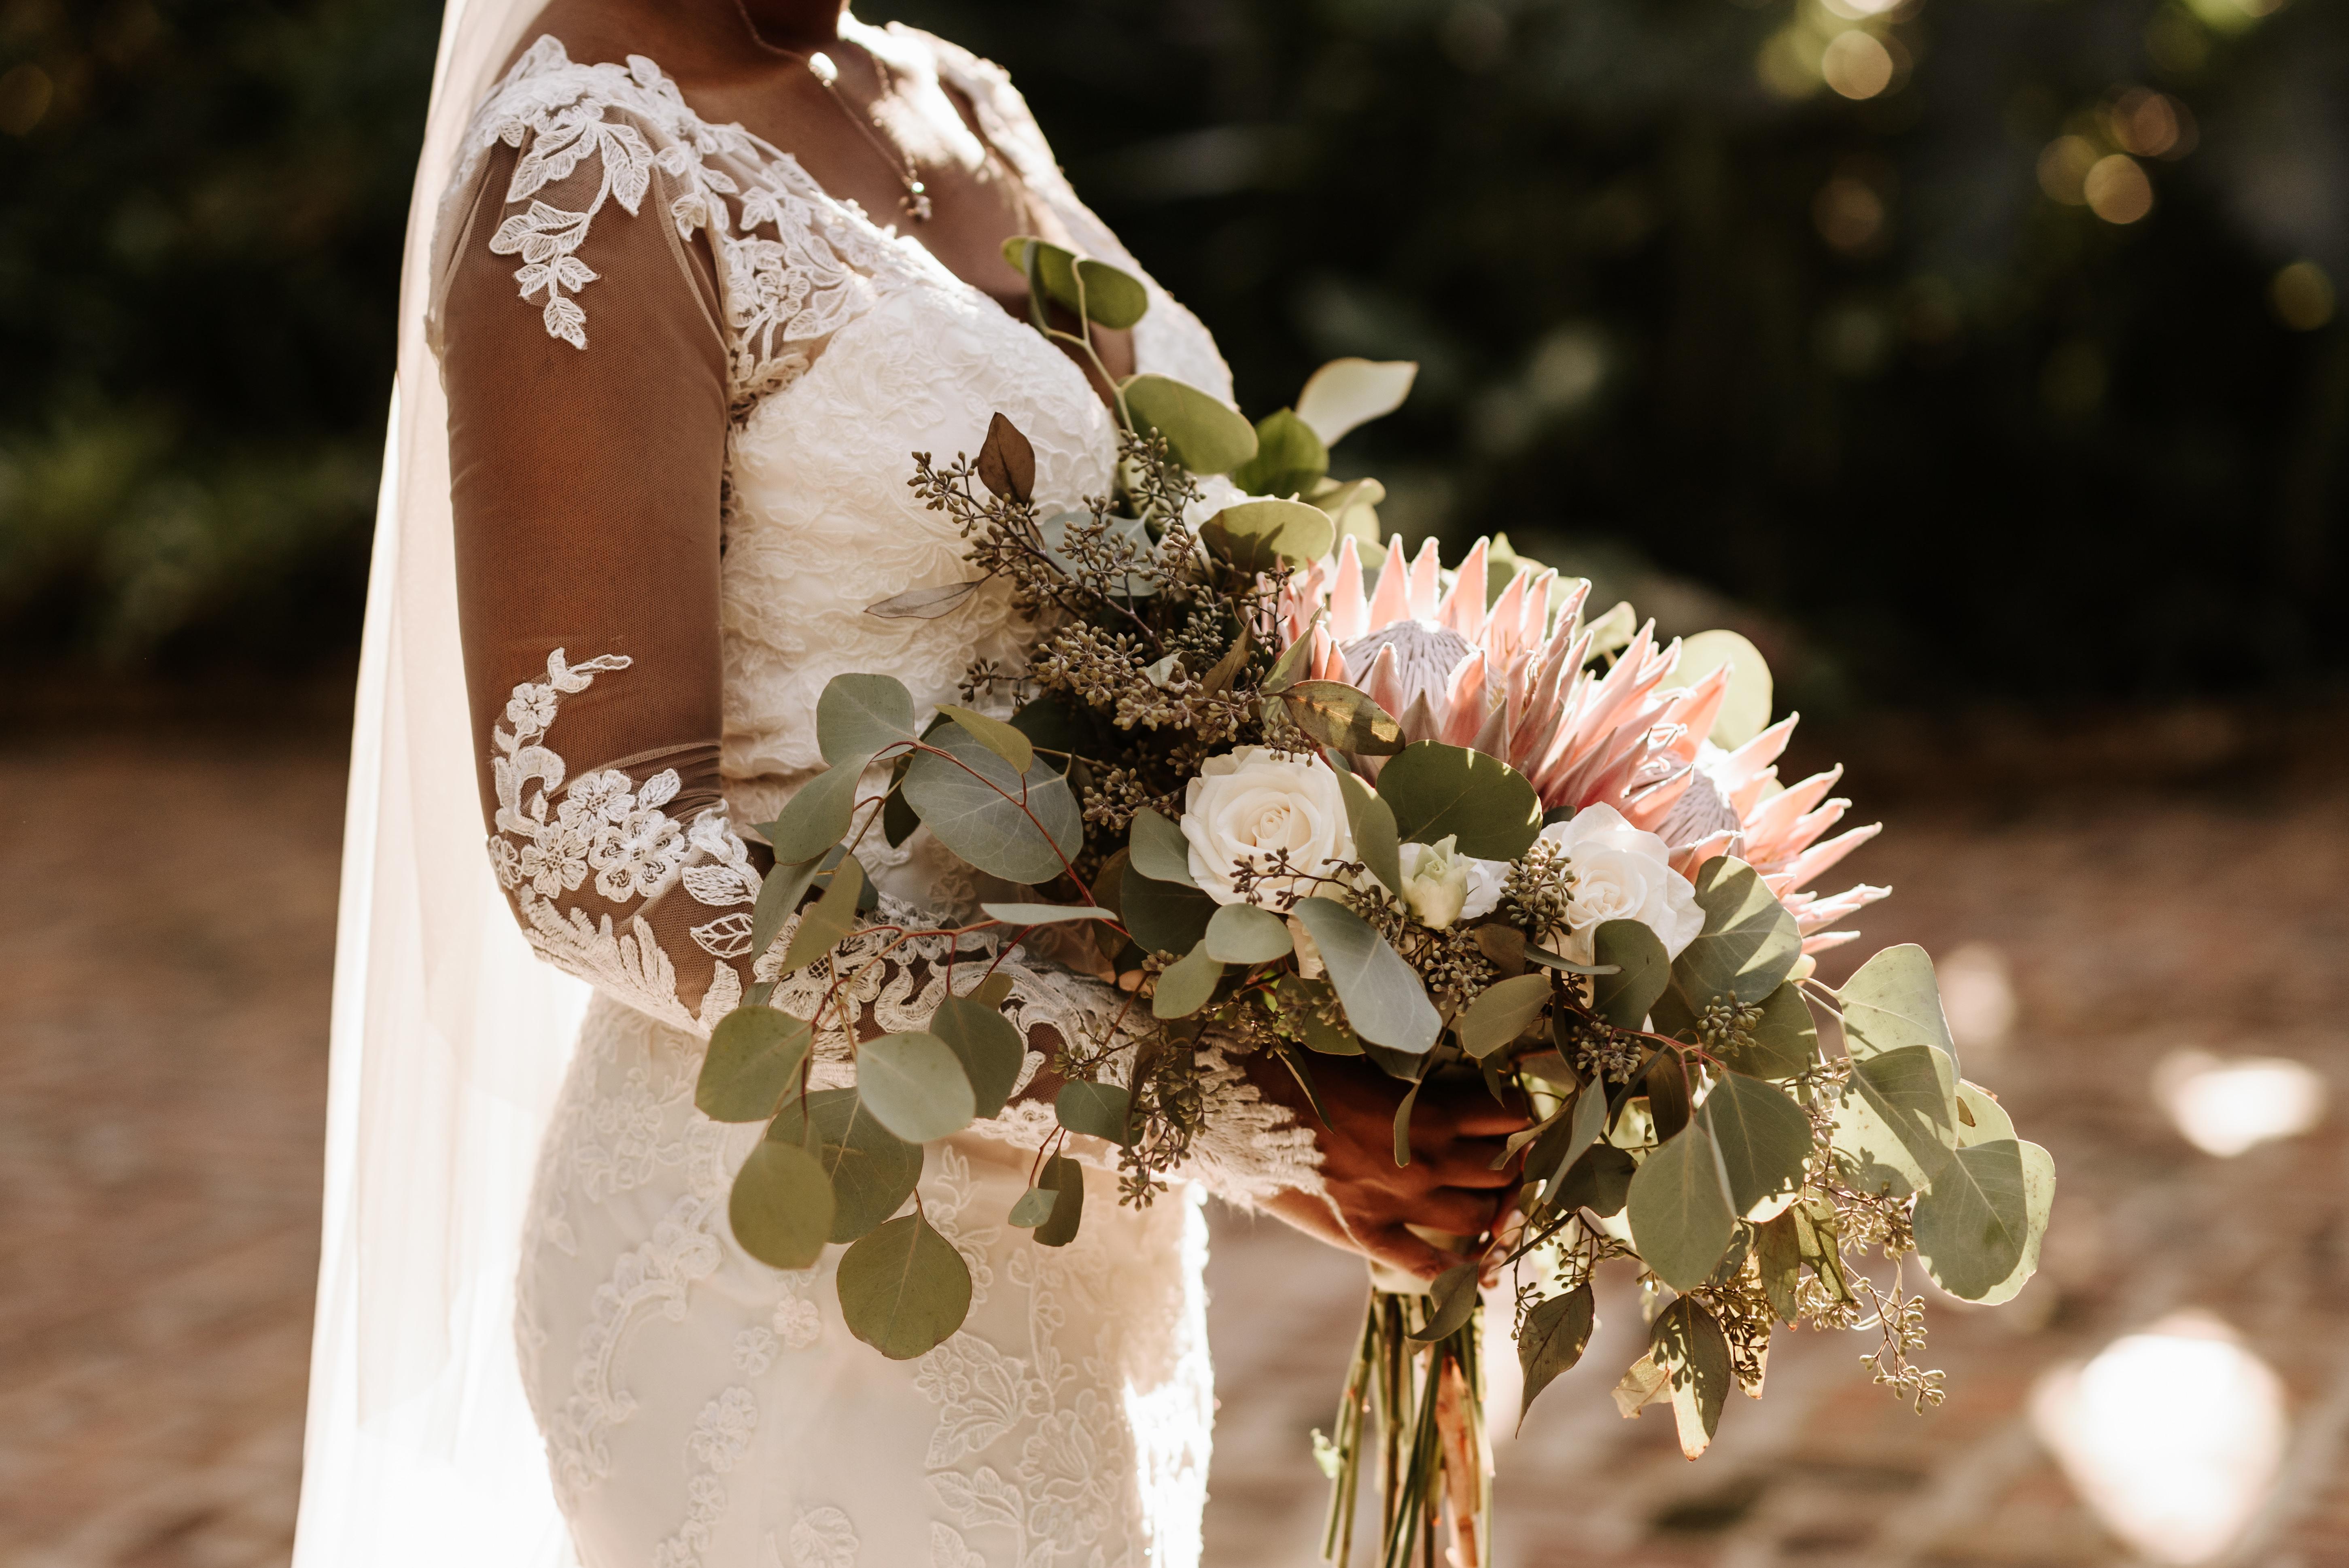 Kristin-Ben-Sunken-Garden-Wedding-Photography-by-V-Previews (70 of 123).jpg